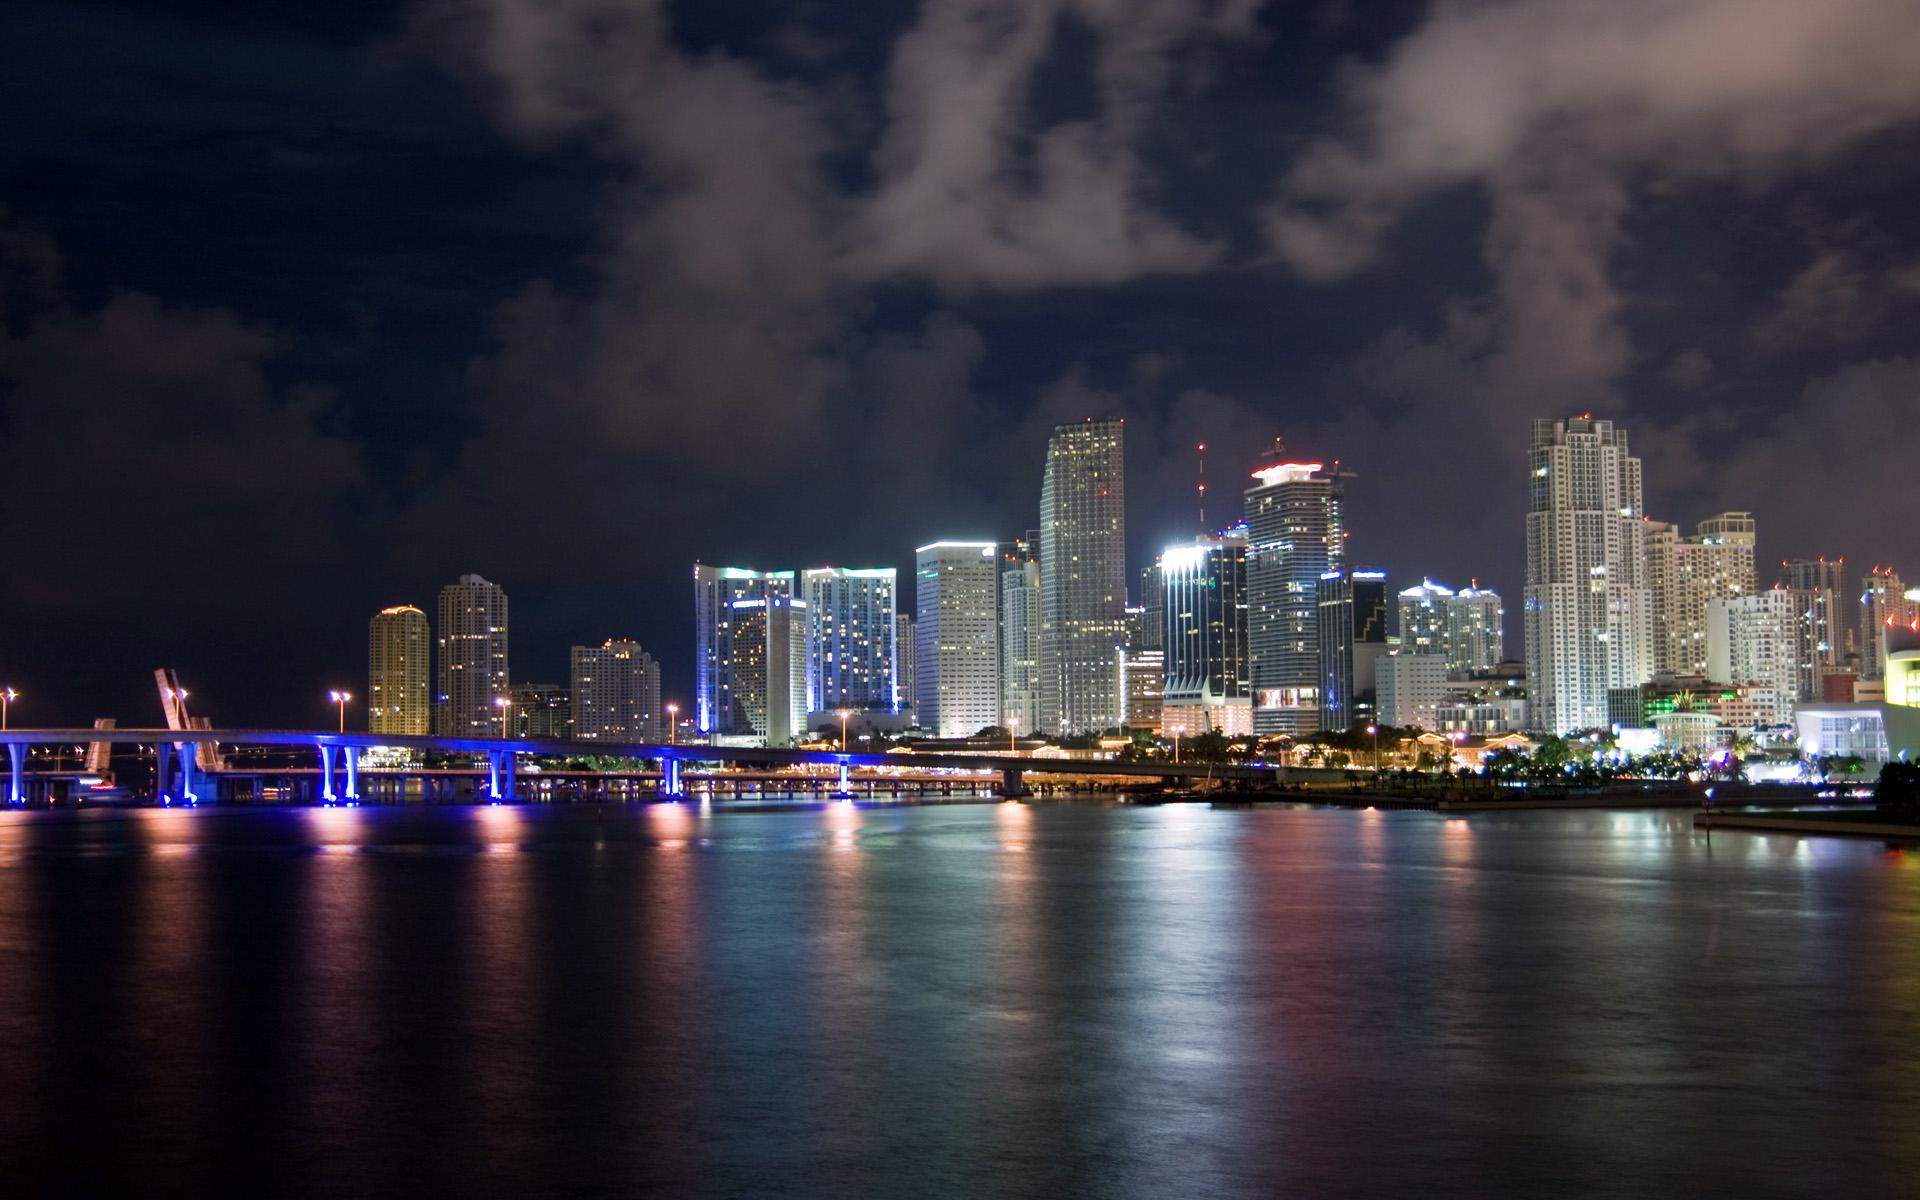 American Flag Wallpaper Hd Hd Miami Wallpapers Pixelstalk Net